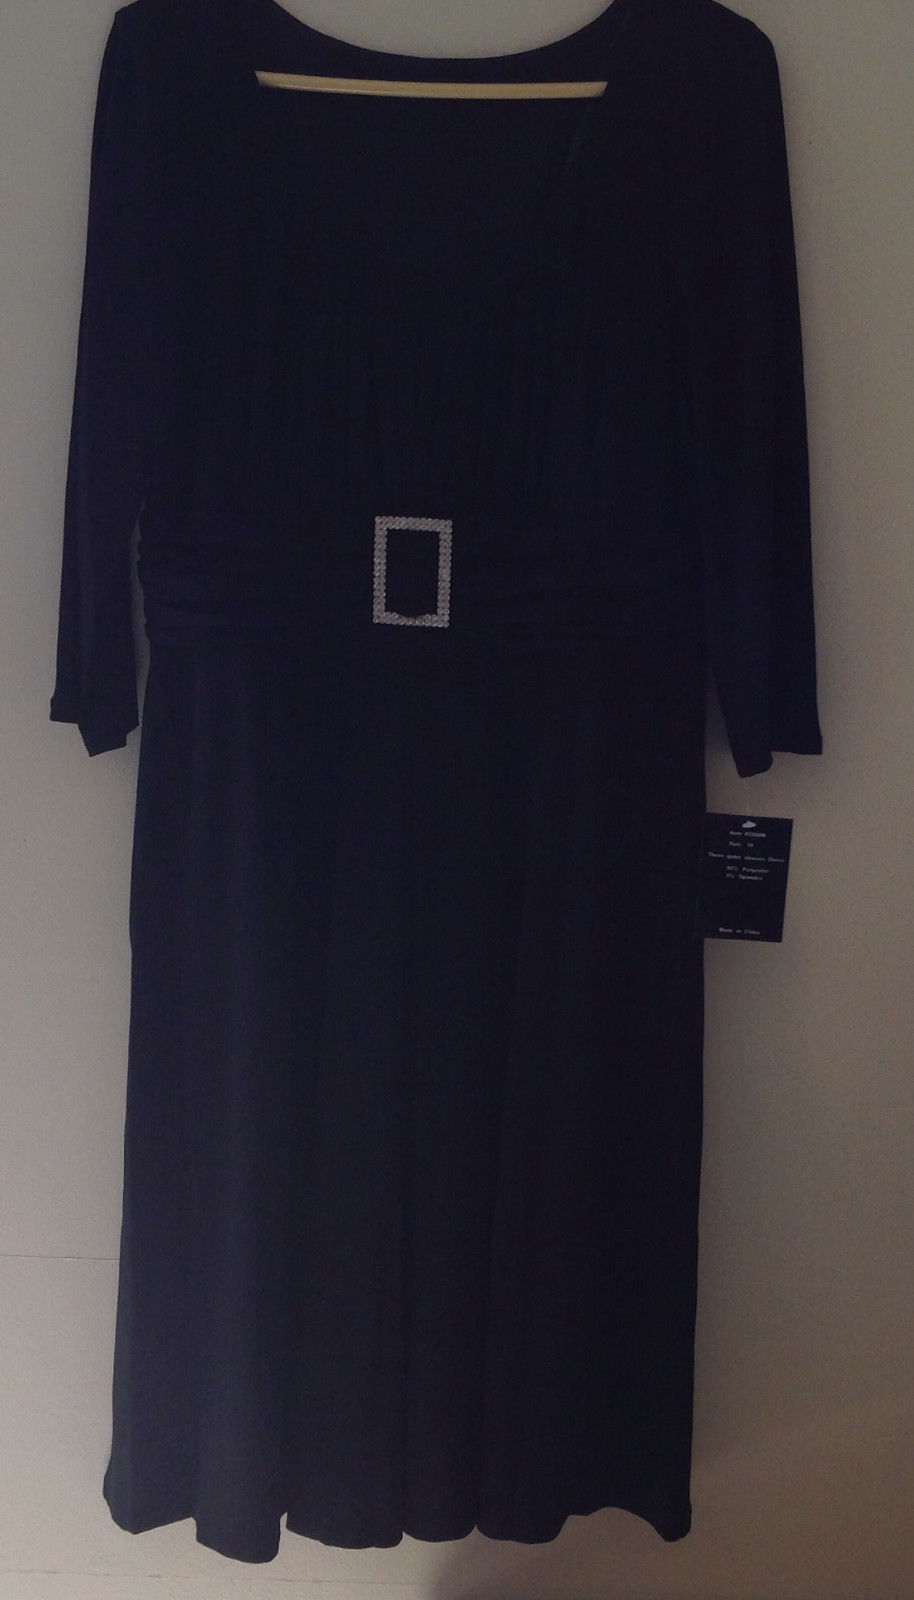 Black Formal Dress Three Quarter Length Sleeves Belt with Buckle Bling Size 10